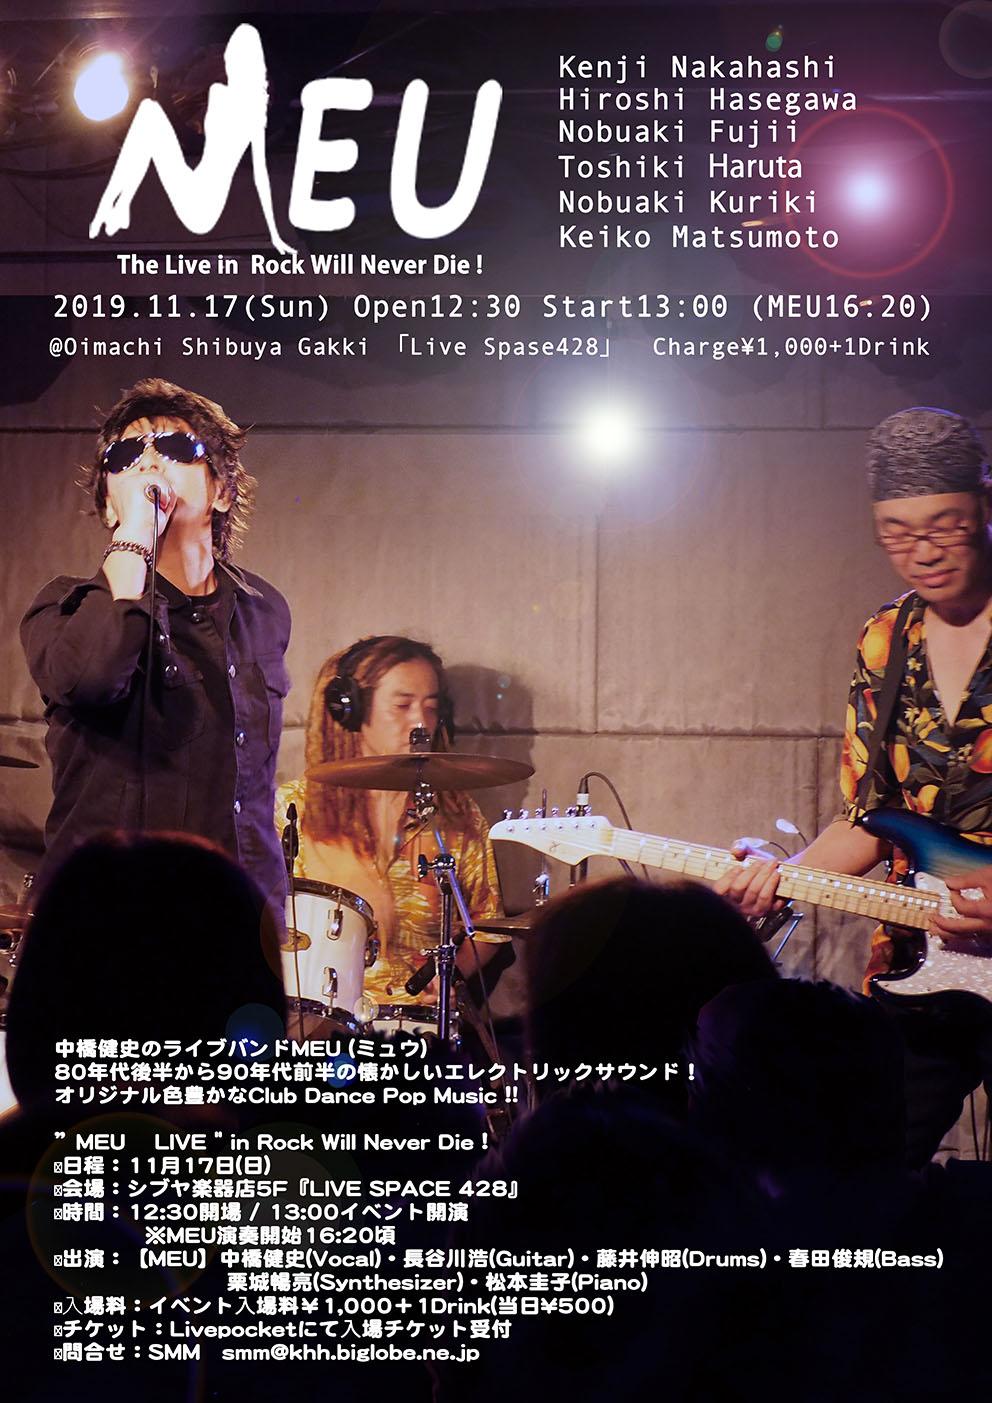 """MEU LIVE"" in Rock Will Never Die !"